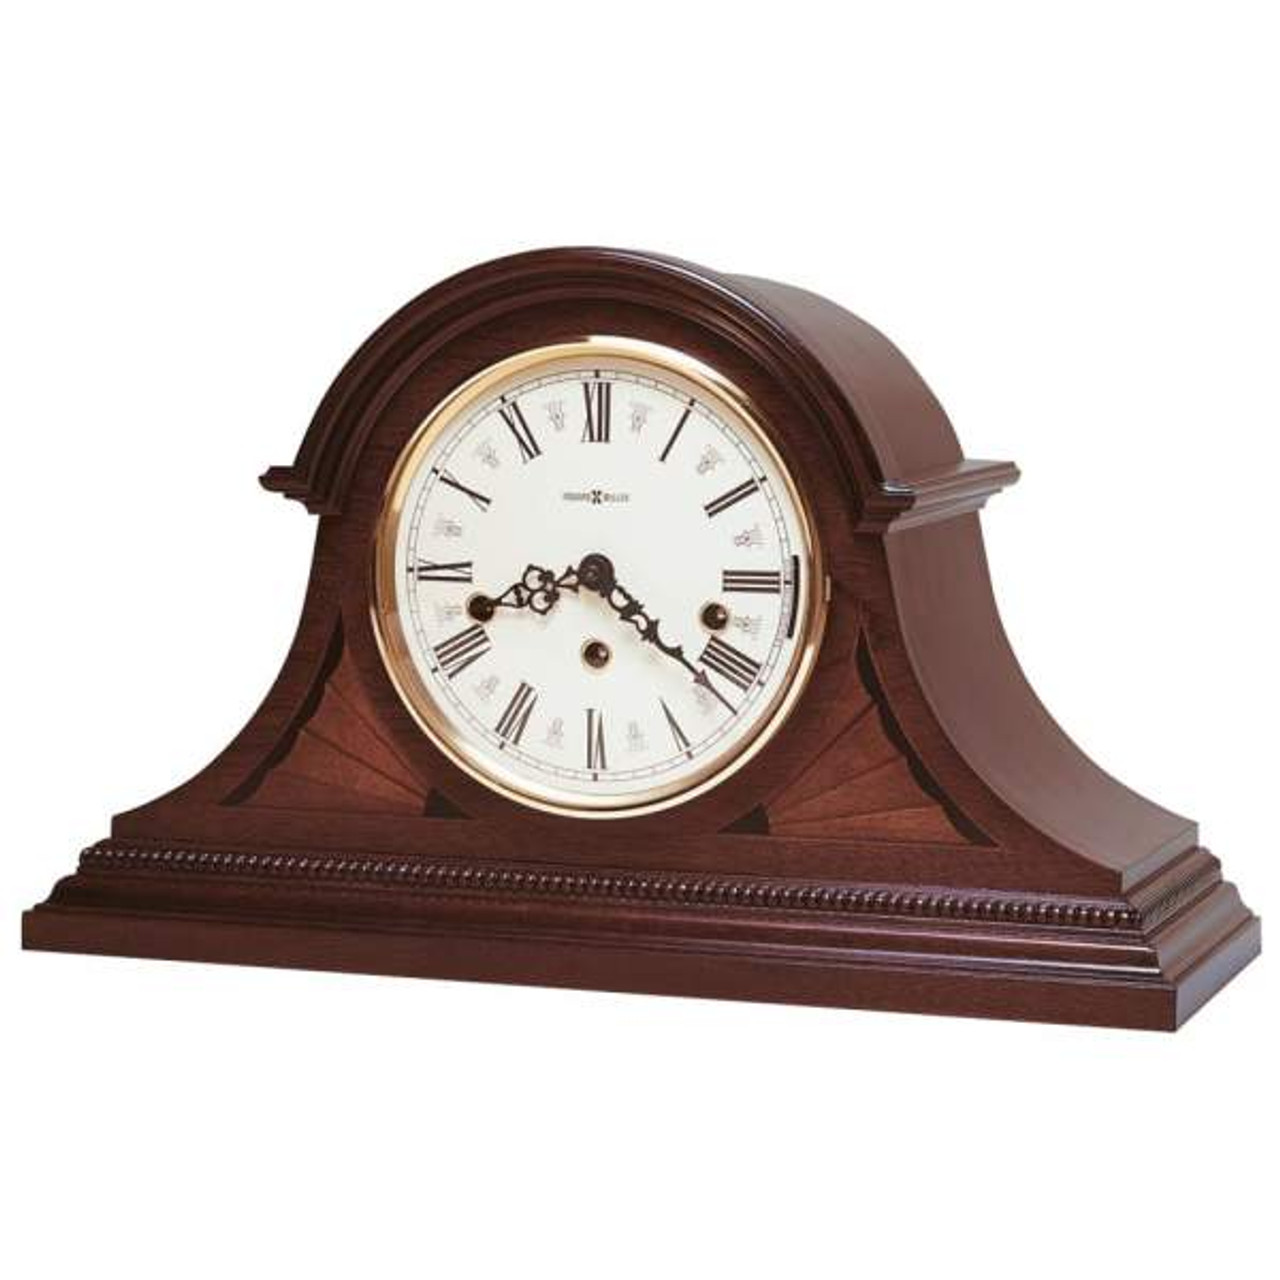 Downing Mantel Clock